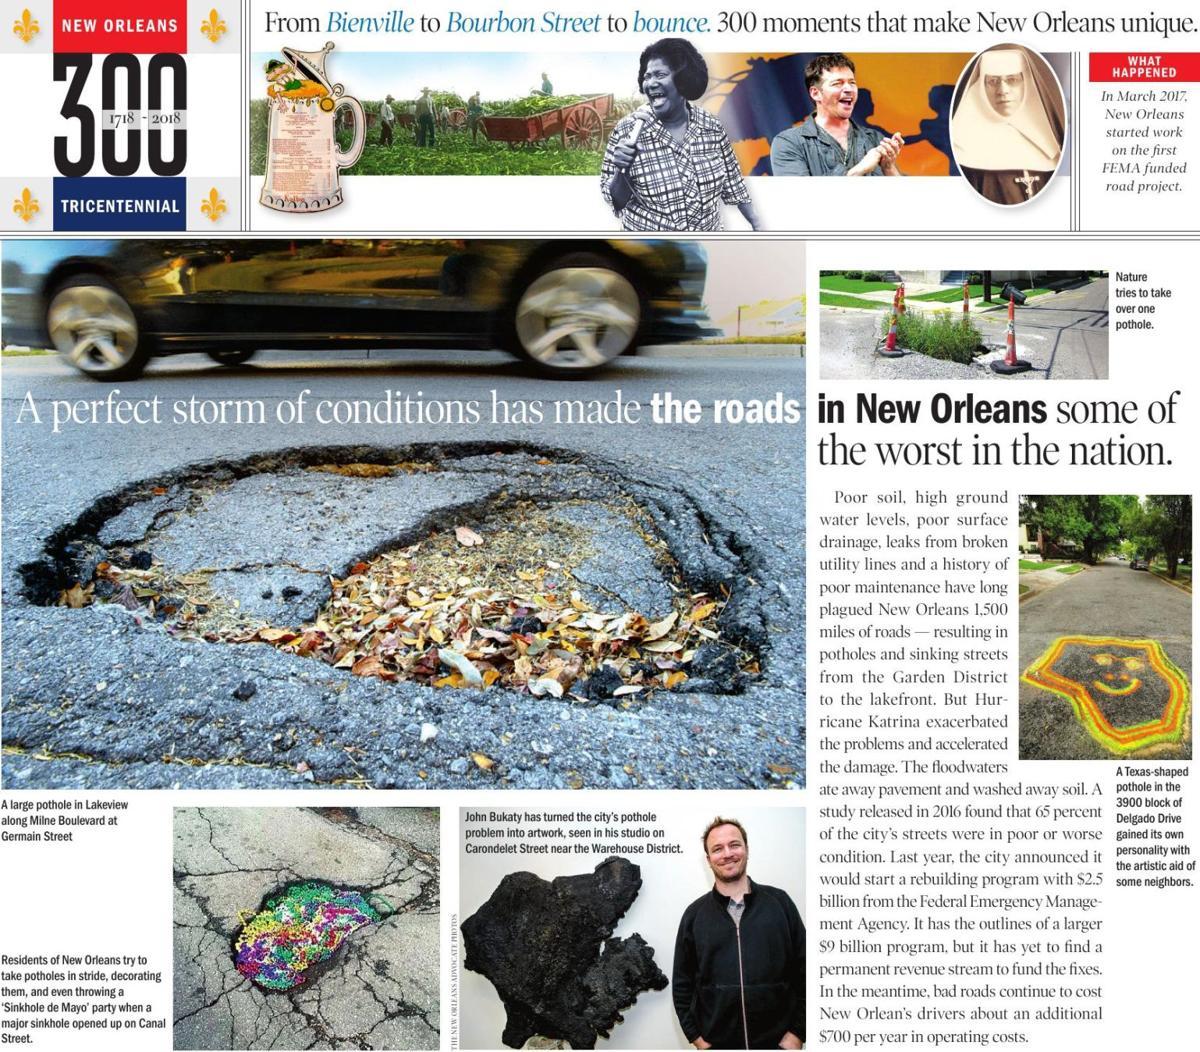 300 unique New Orleans moments: Potholes, street problems and FEMA